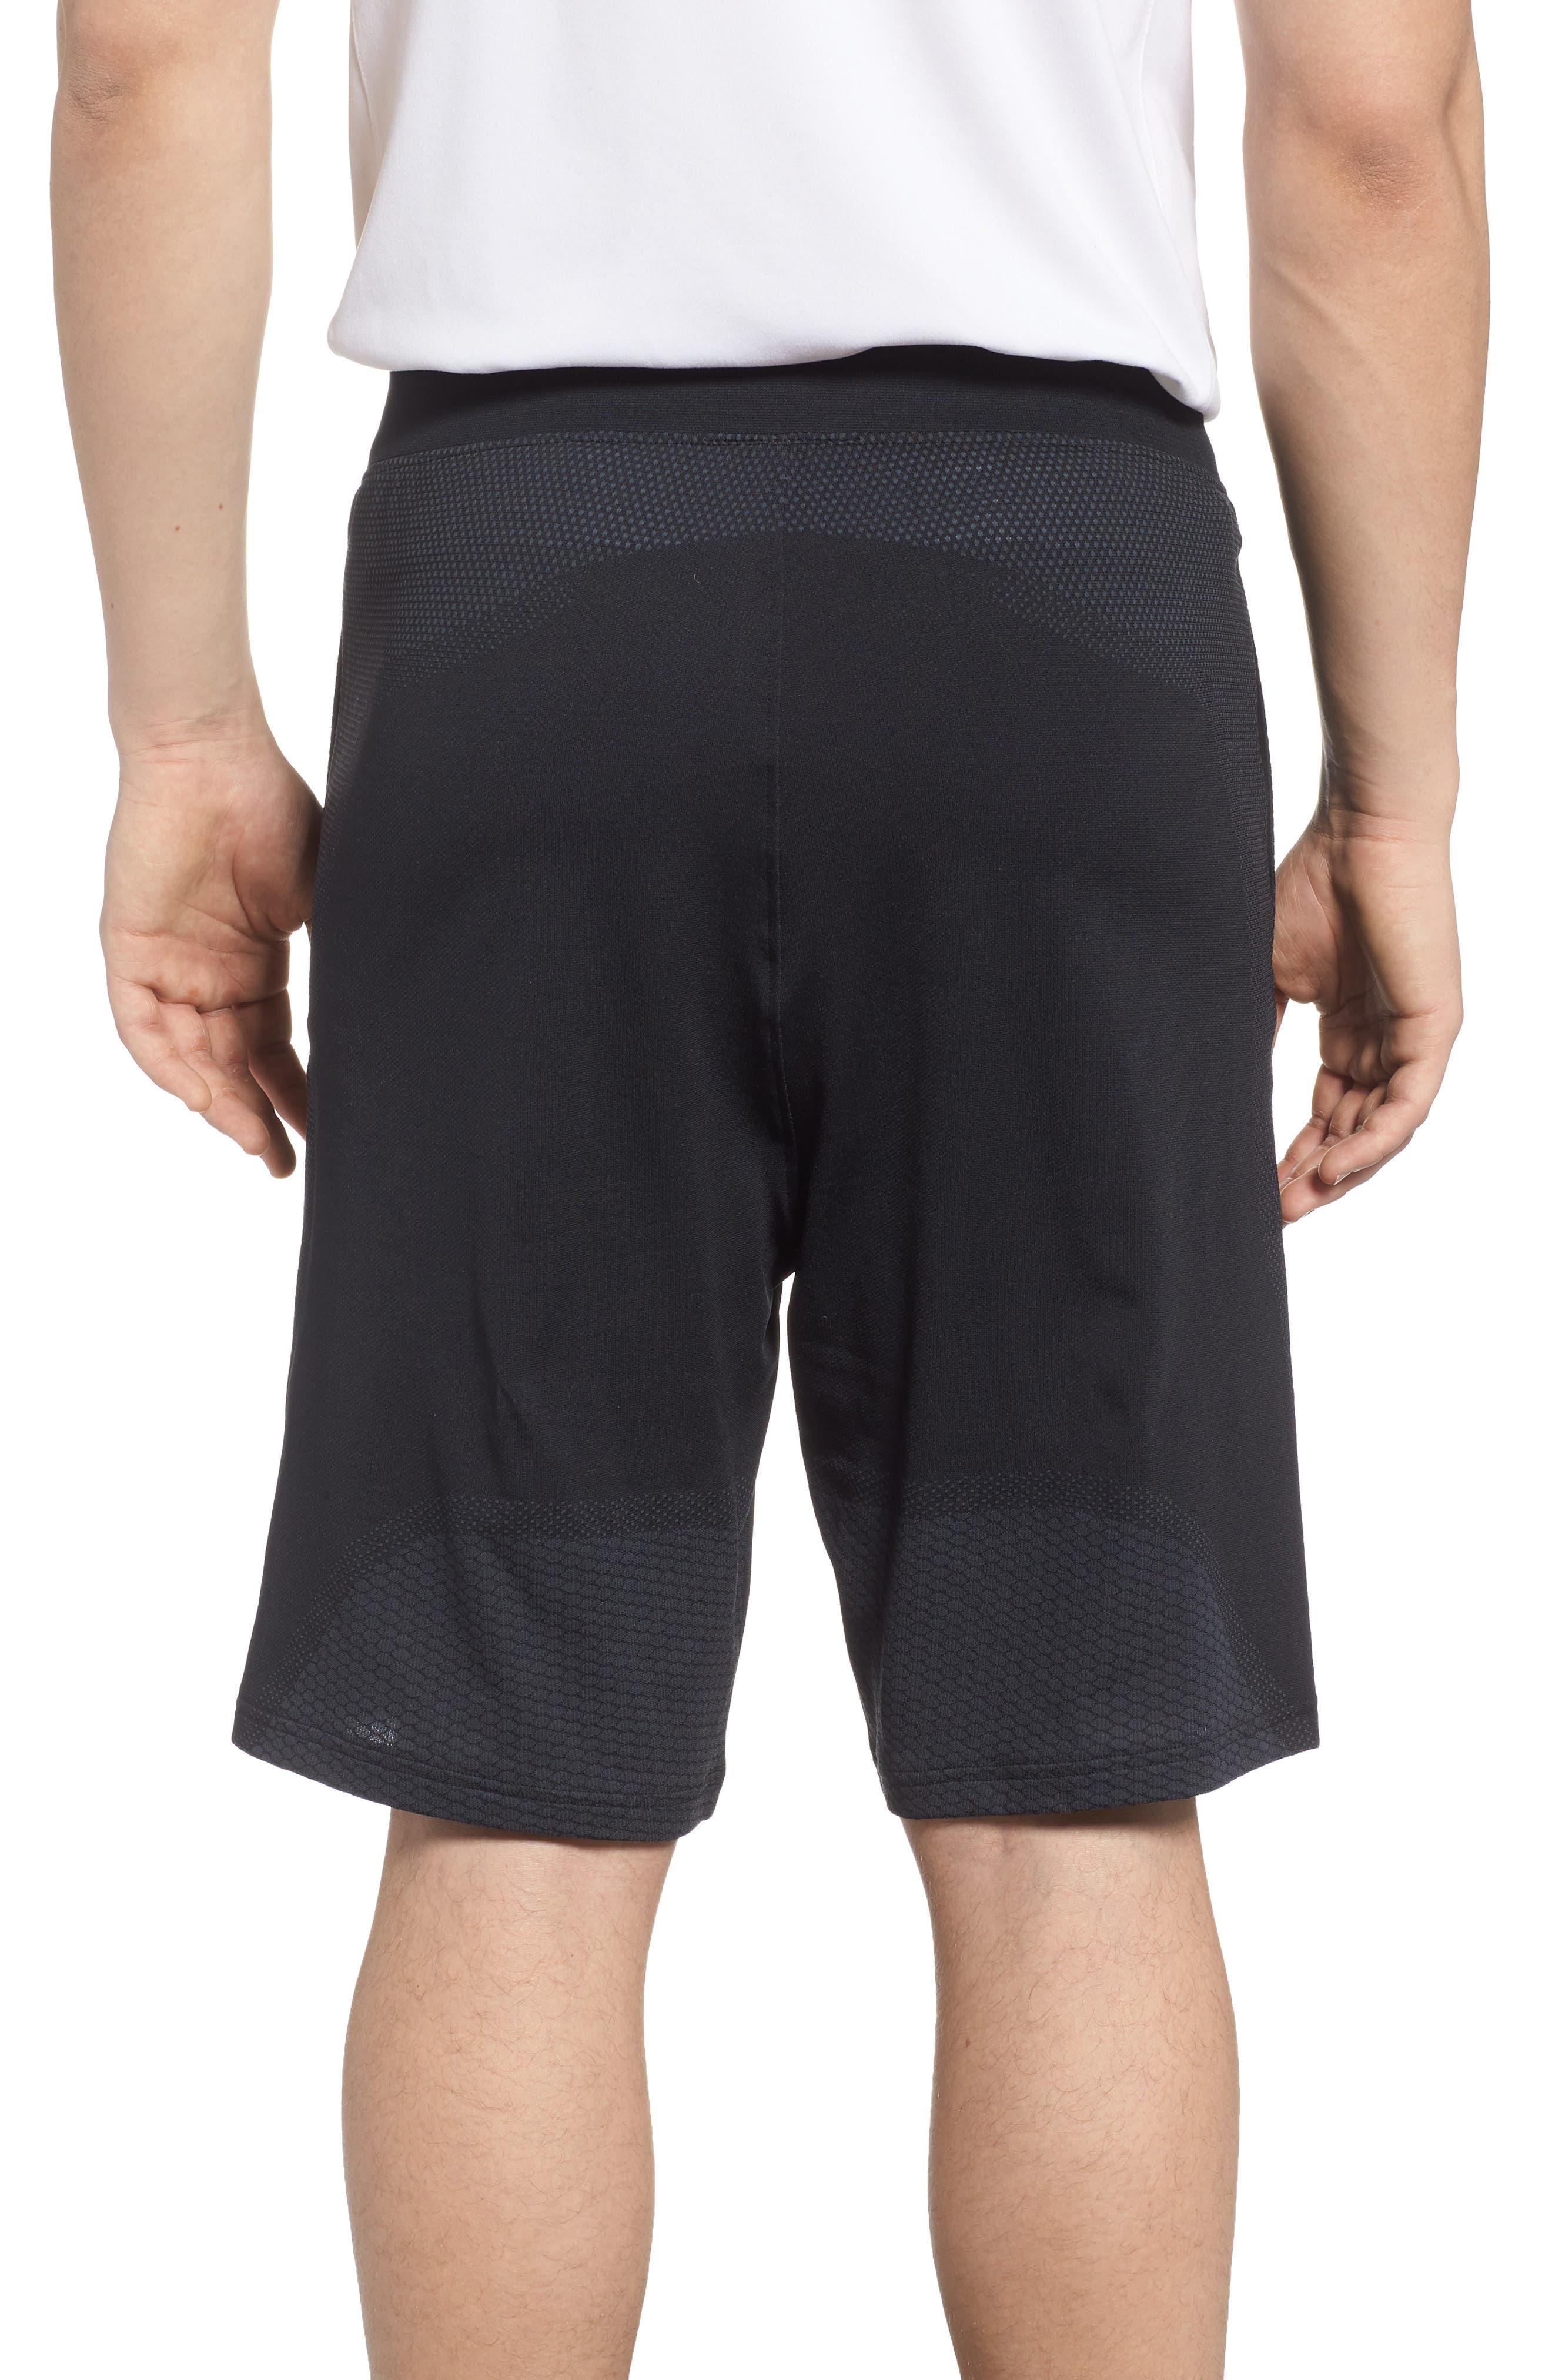 Threadborne Seamless Shorts,                             Alternate thumbnail 2, color,                             BLACK/ STEALTH GREH